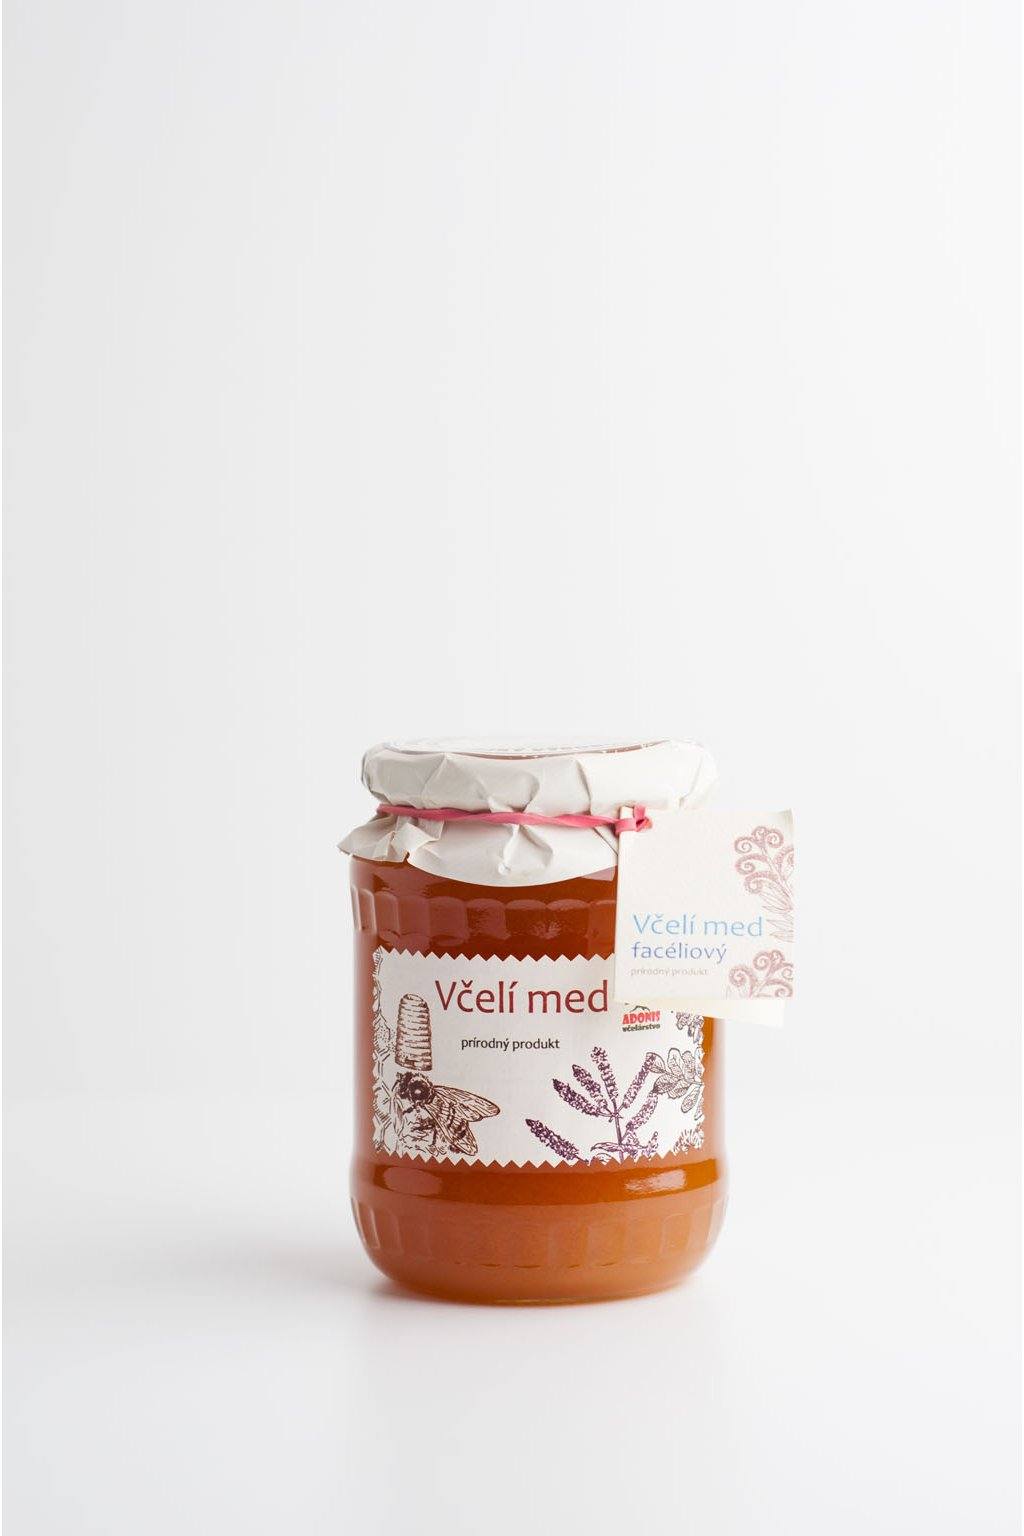 Faceliový med - 900g